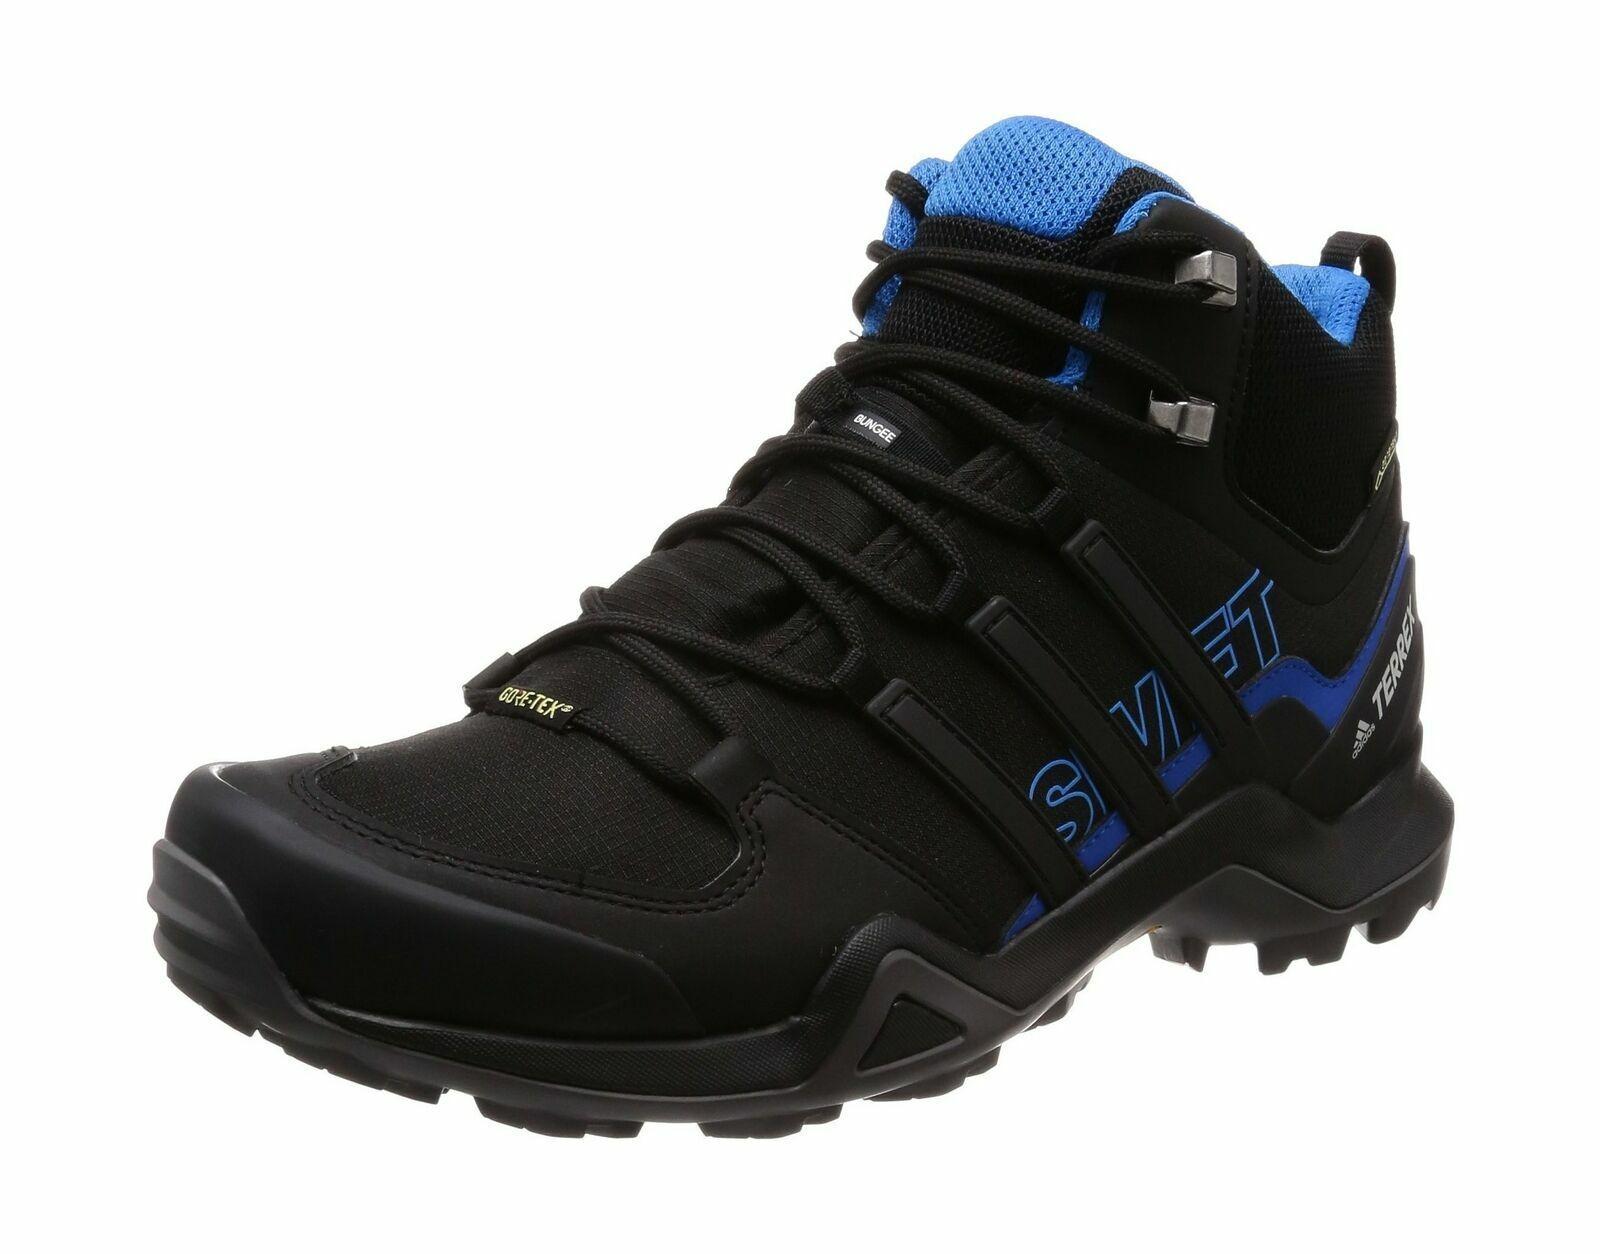 Adidas Men's Terrex Swift R2 Mid GTX High Rise Hiking Boots us-8.5